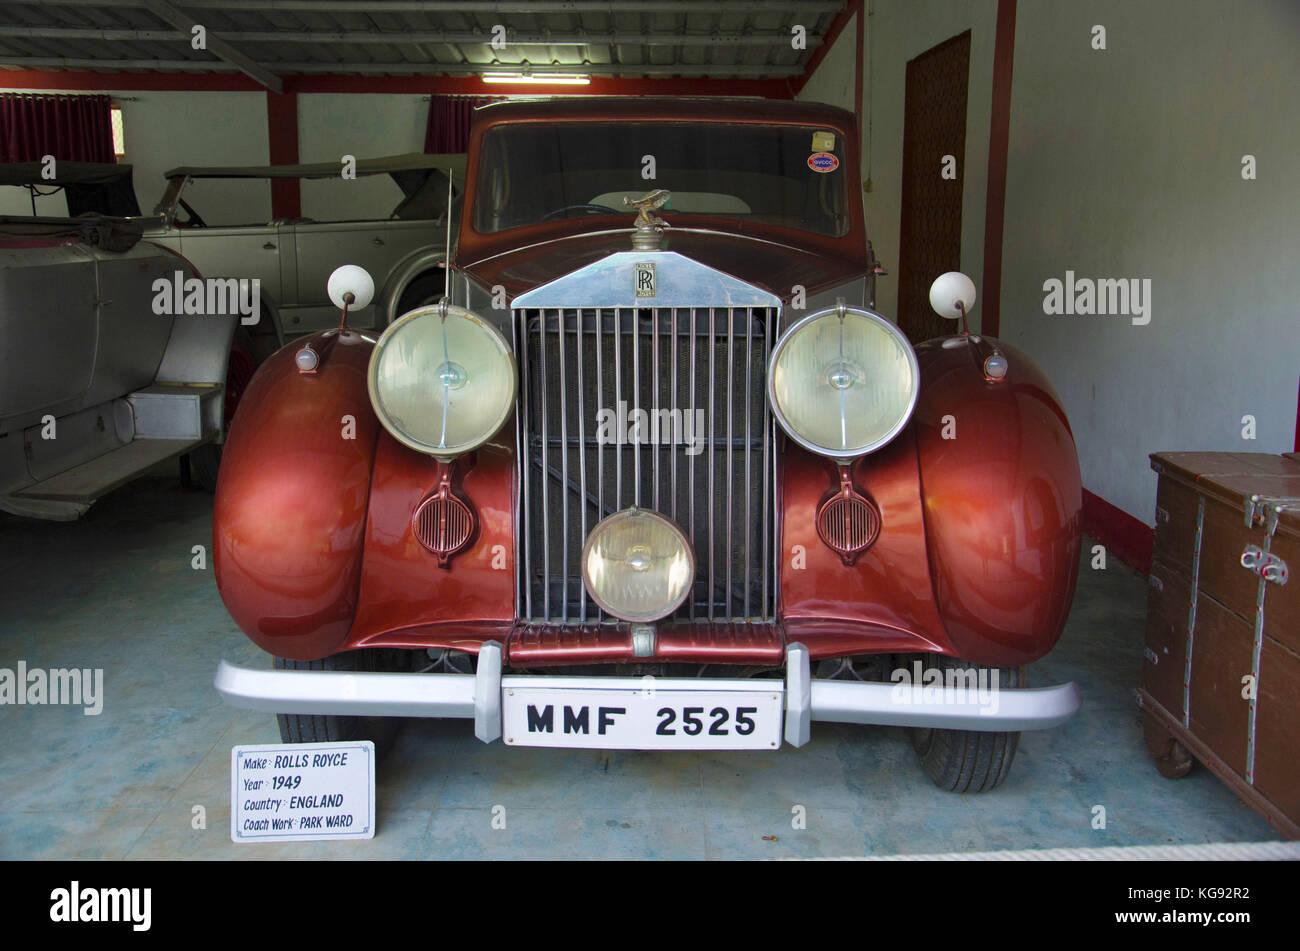 Rolls Royce (Year 1949), Coach work - park ward, England Auto world ...